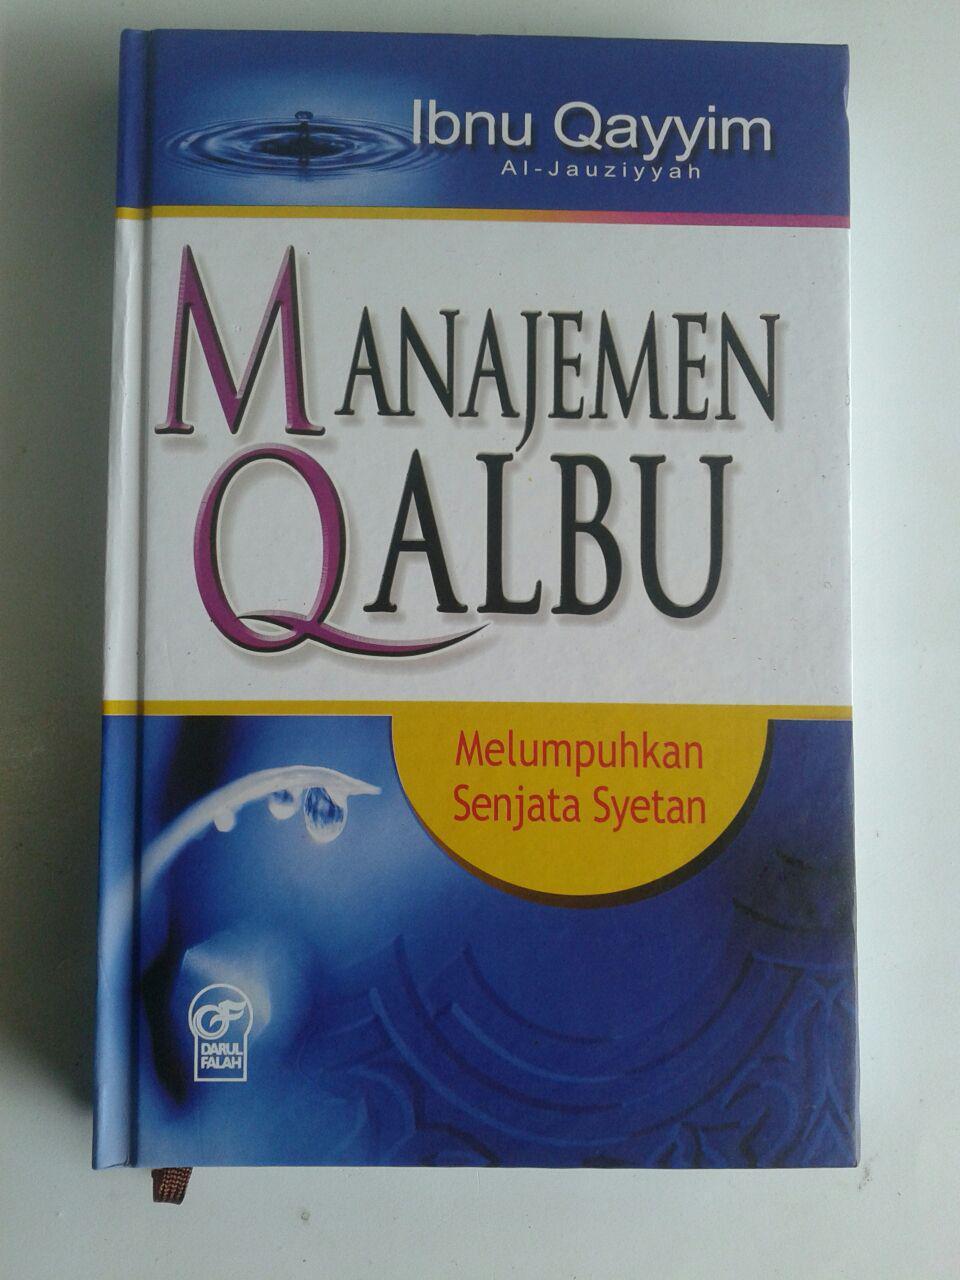 Buku Manajemen Qalbu cover 2